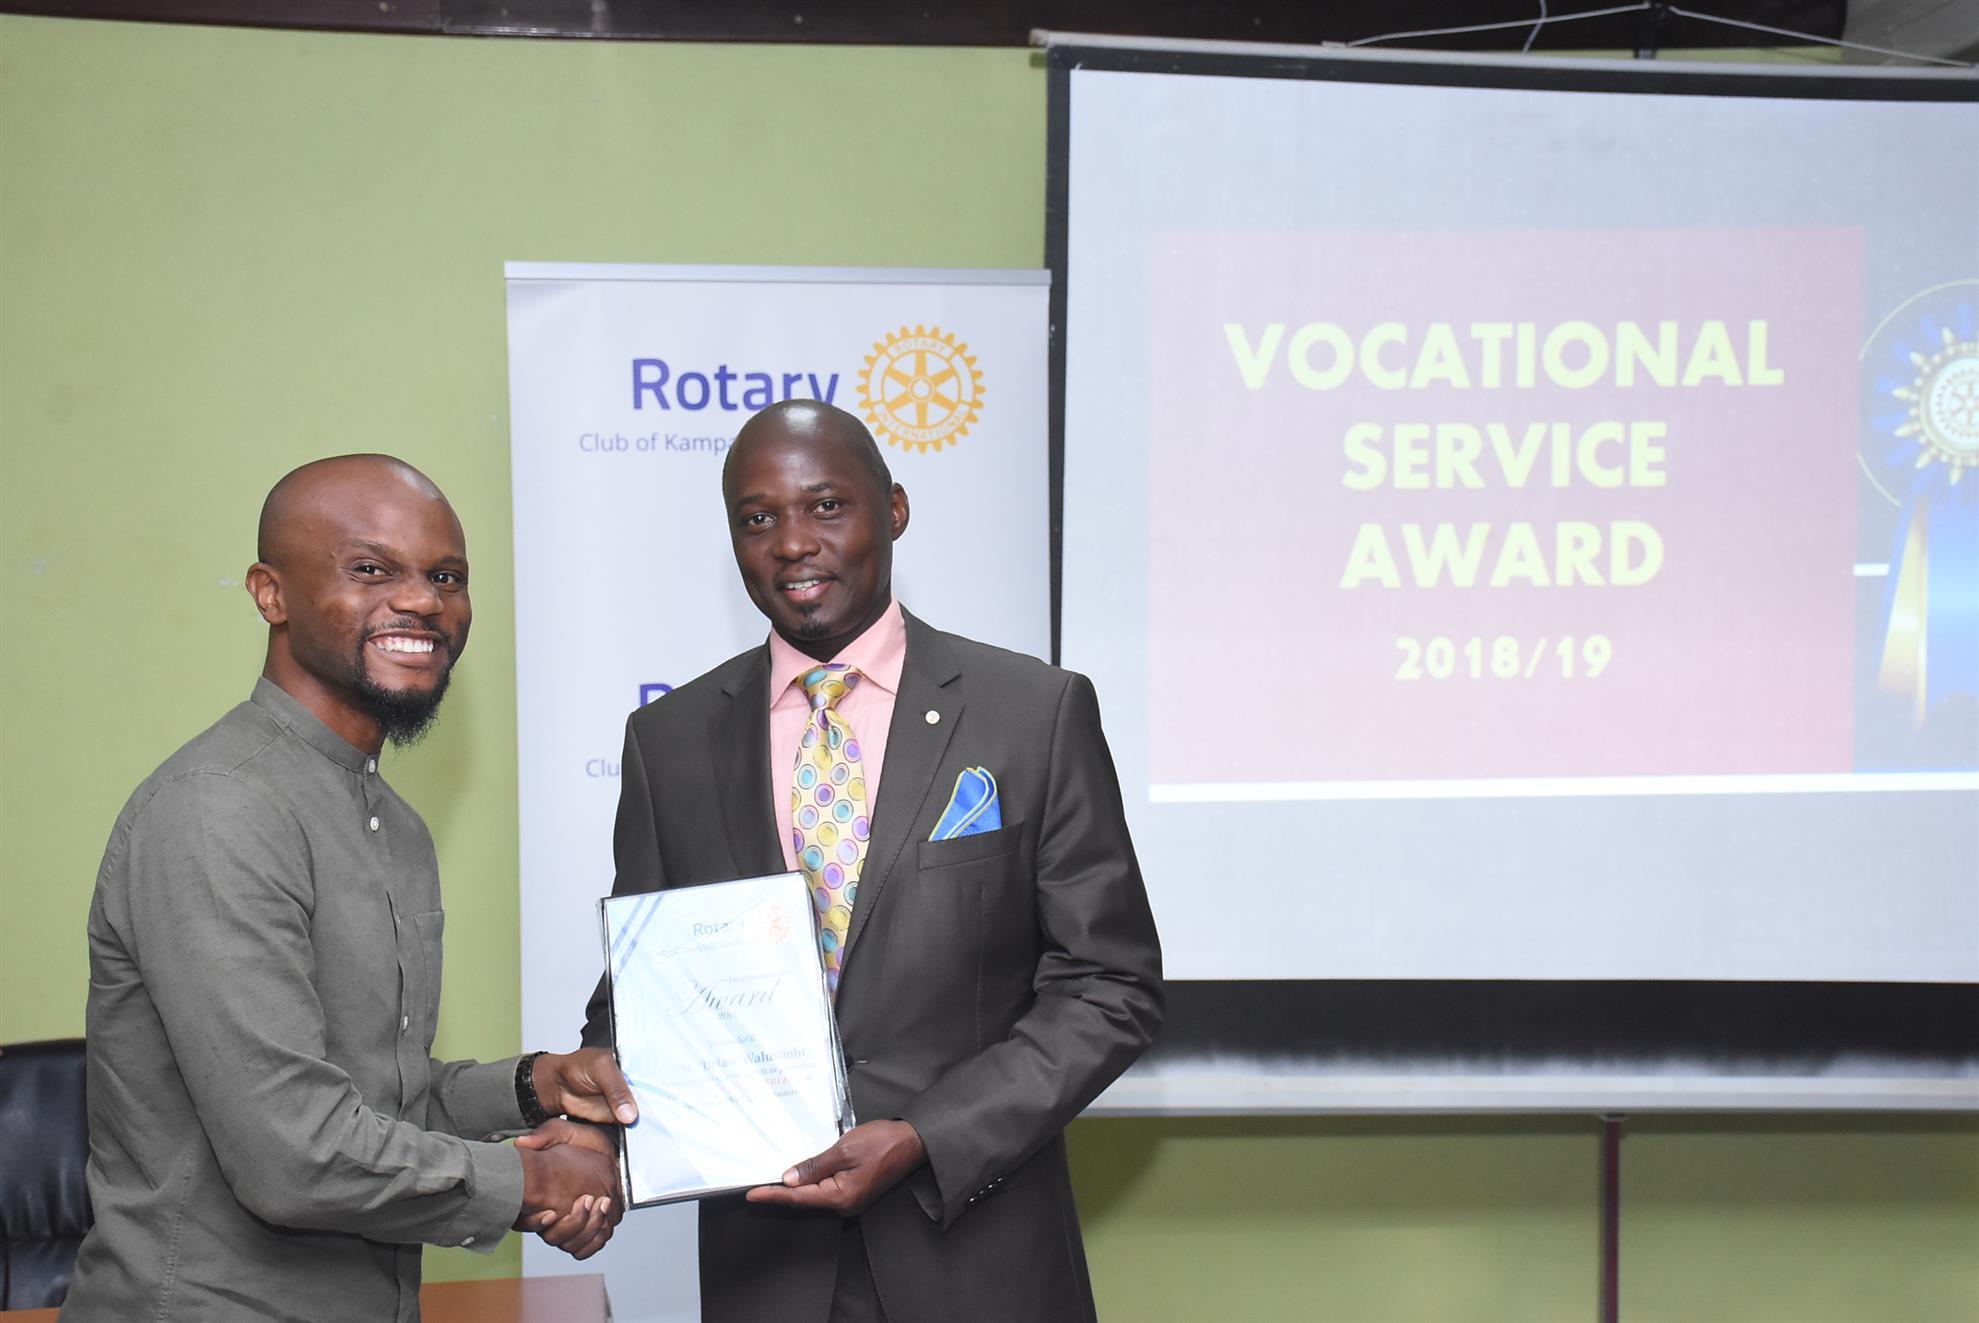 Fellow receives serviced